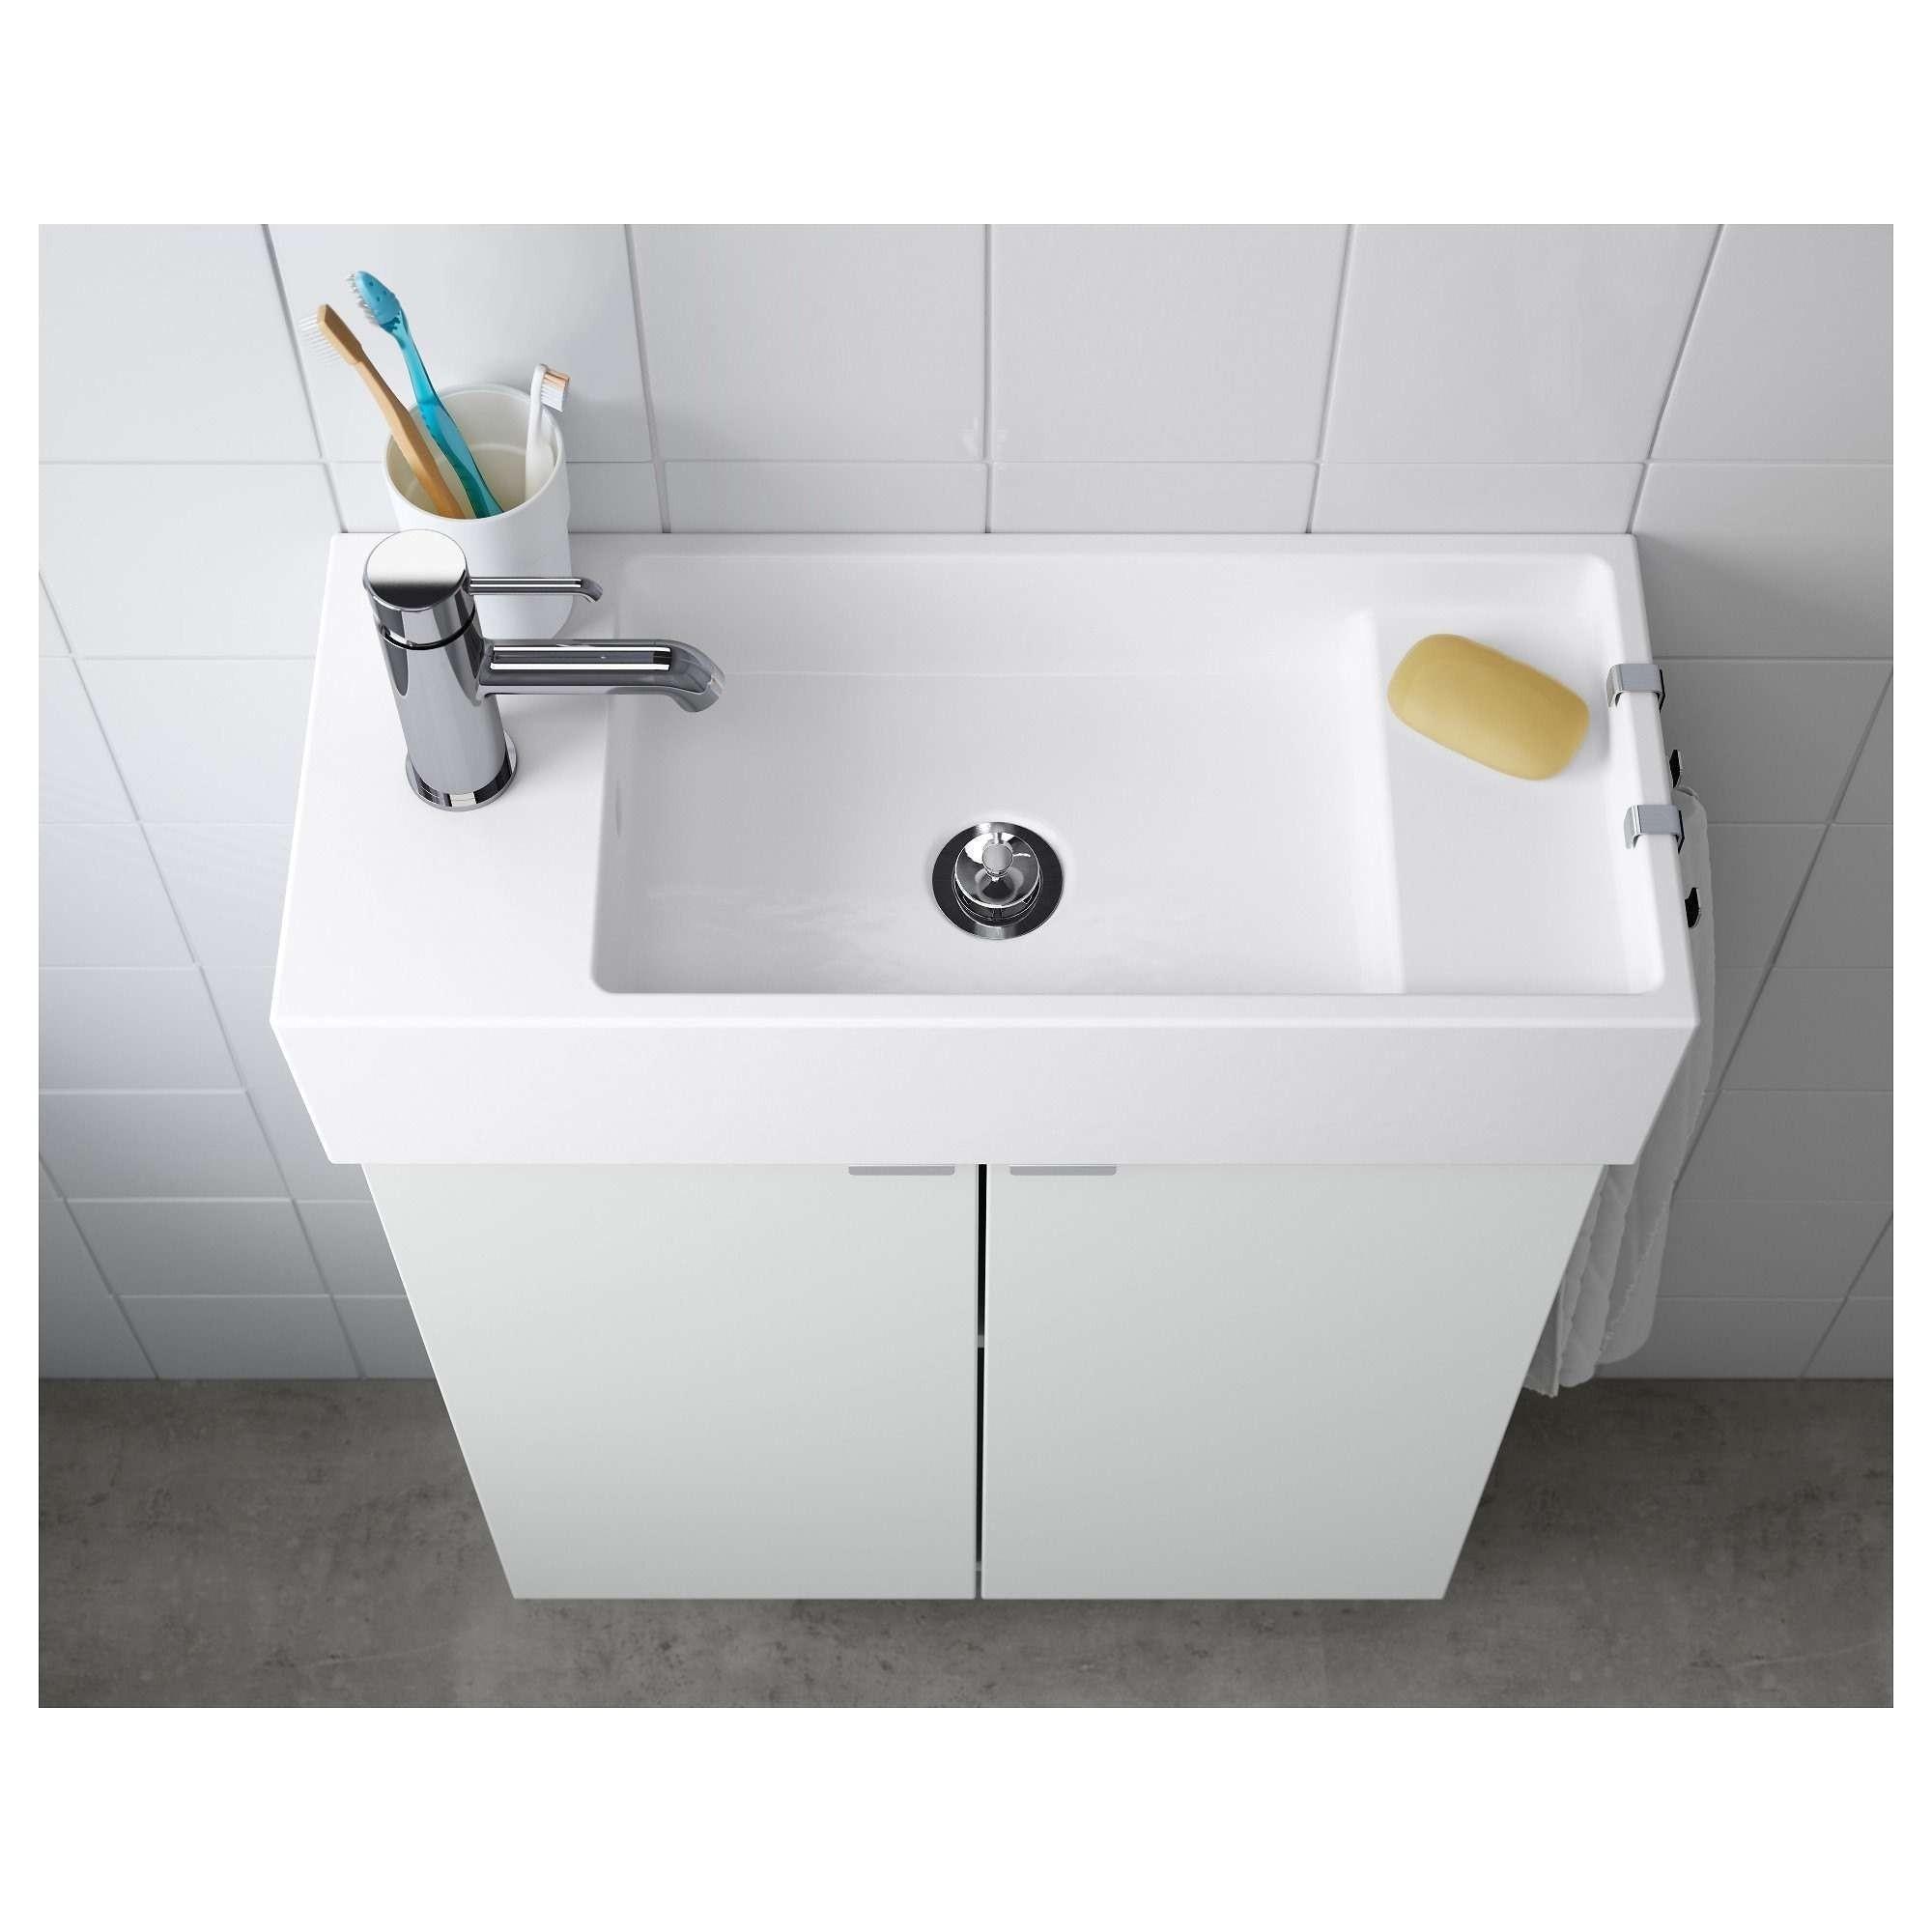 Ikea Bathroom Design Ideas Wondrous Ikea Small Bathroom Ideas